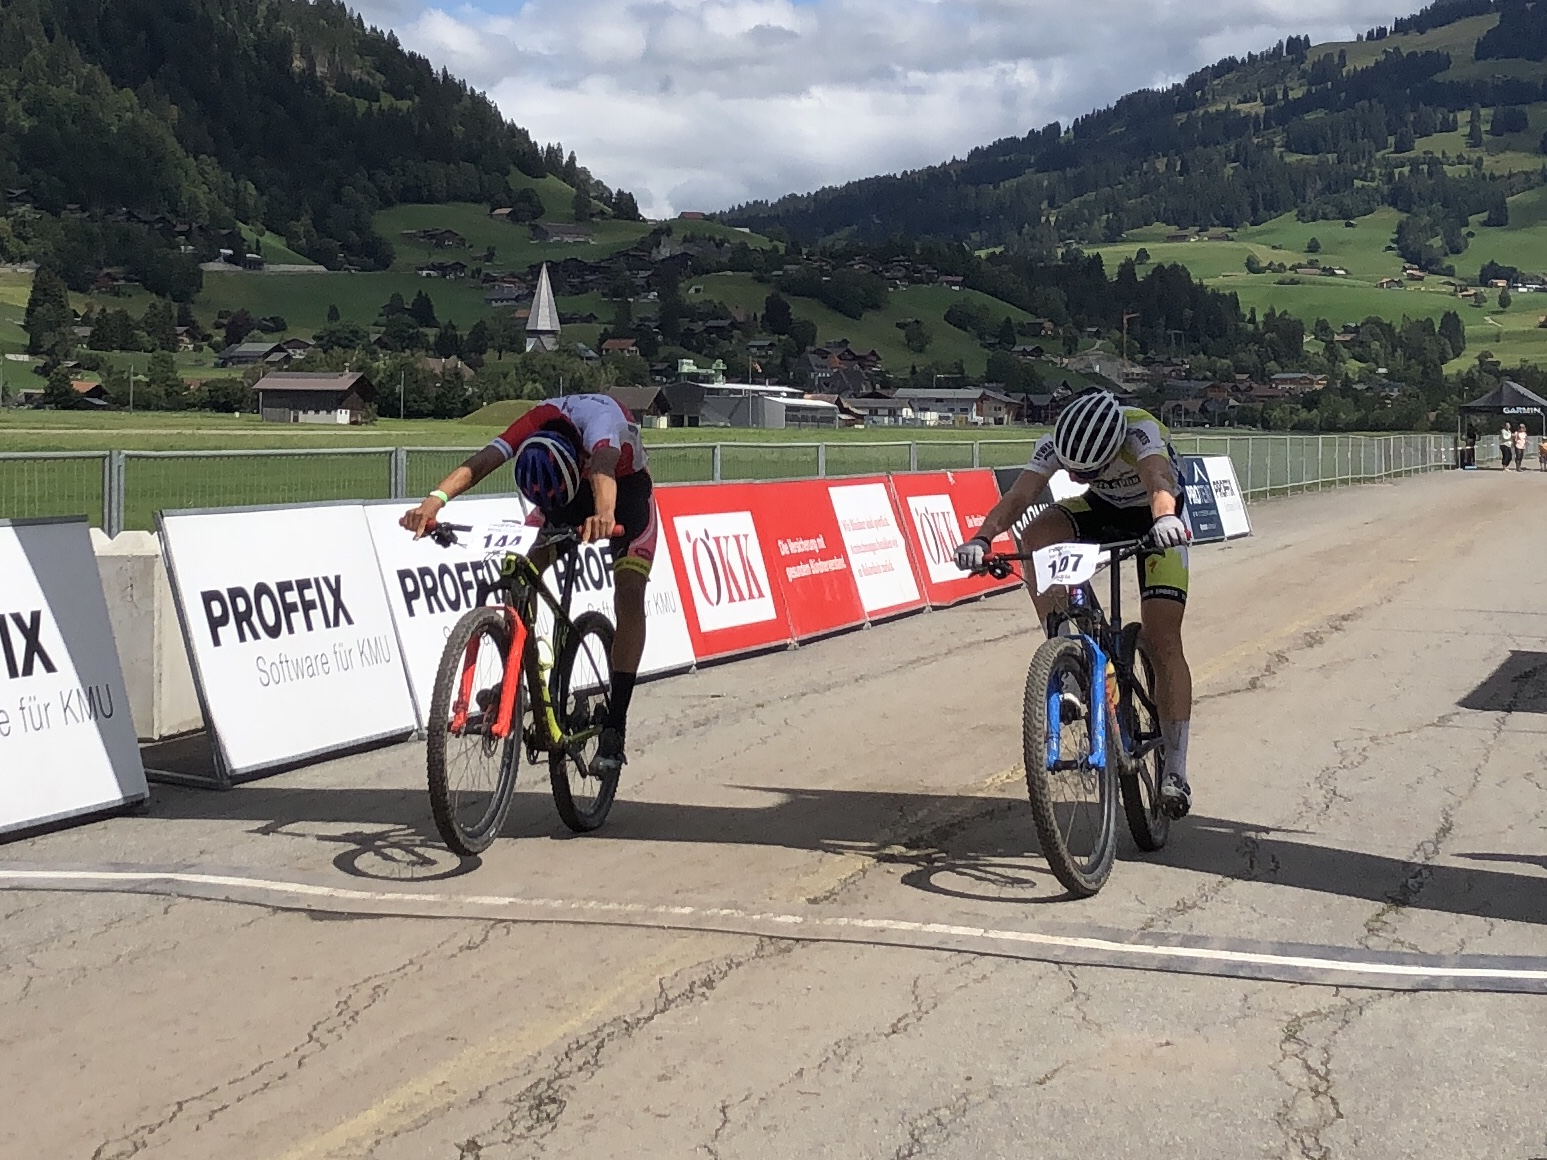 PROFFIX Swiss Bike Cup Gstaad